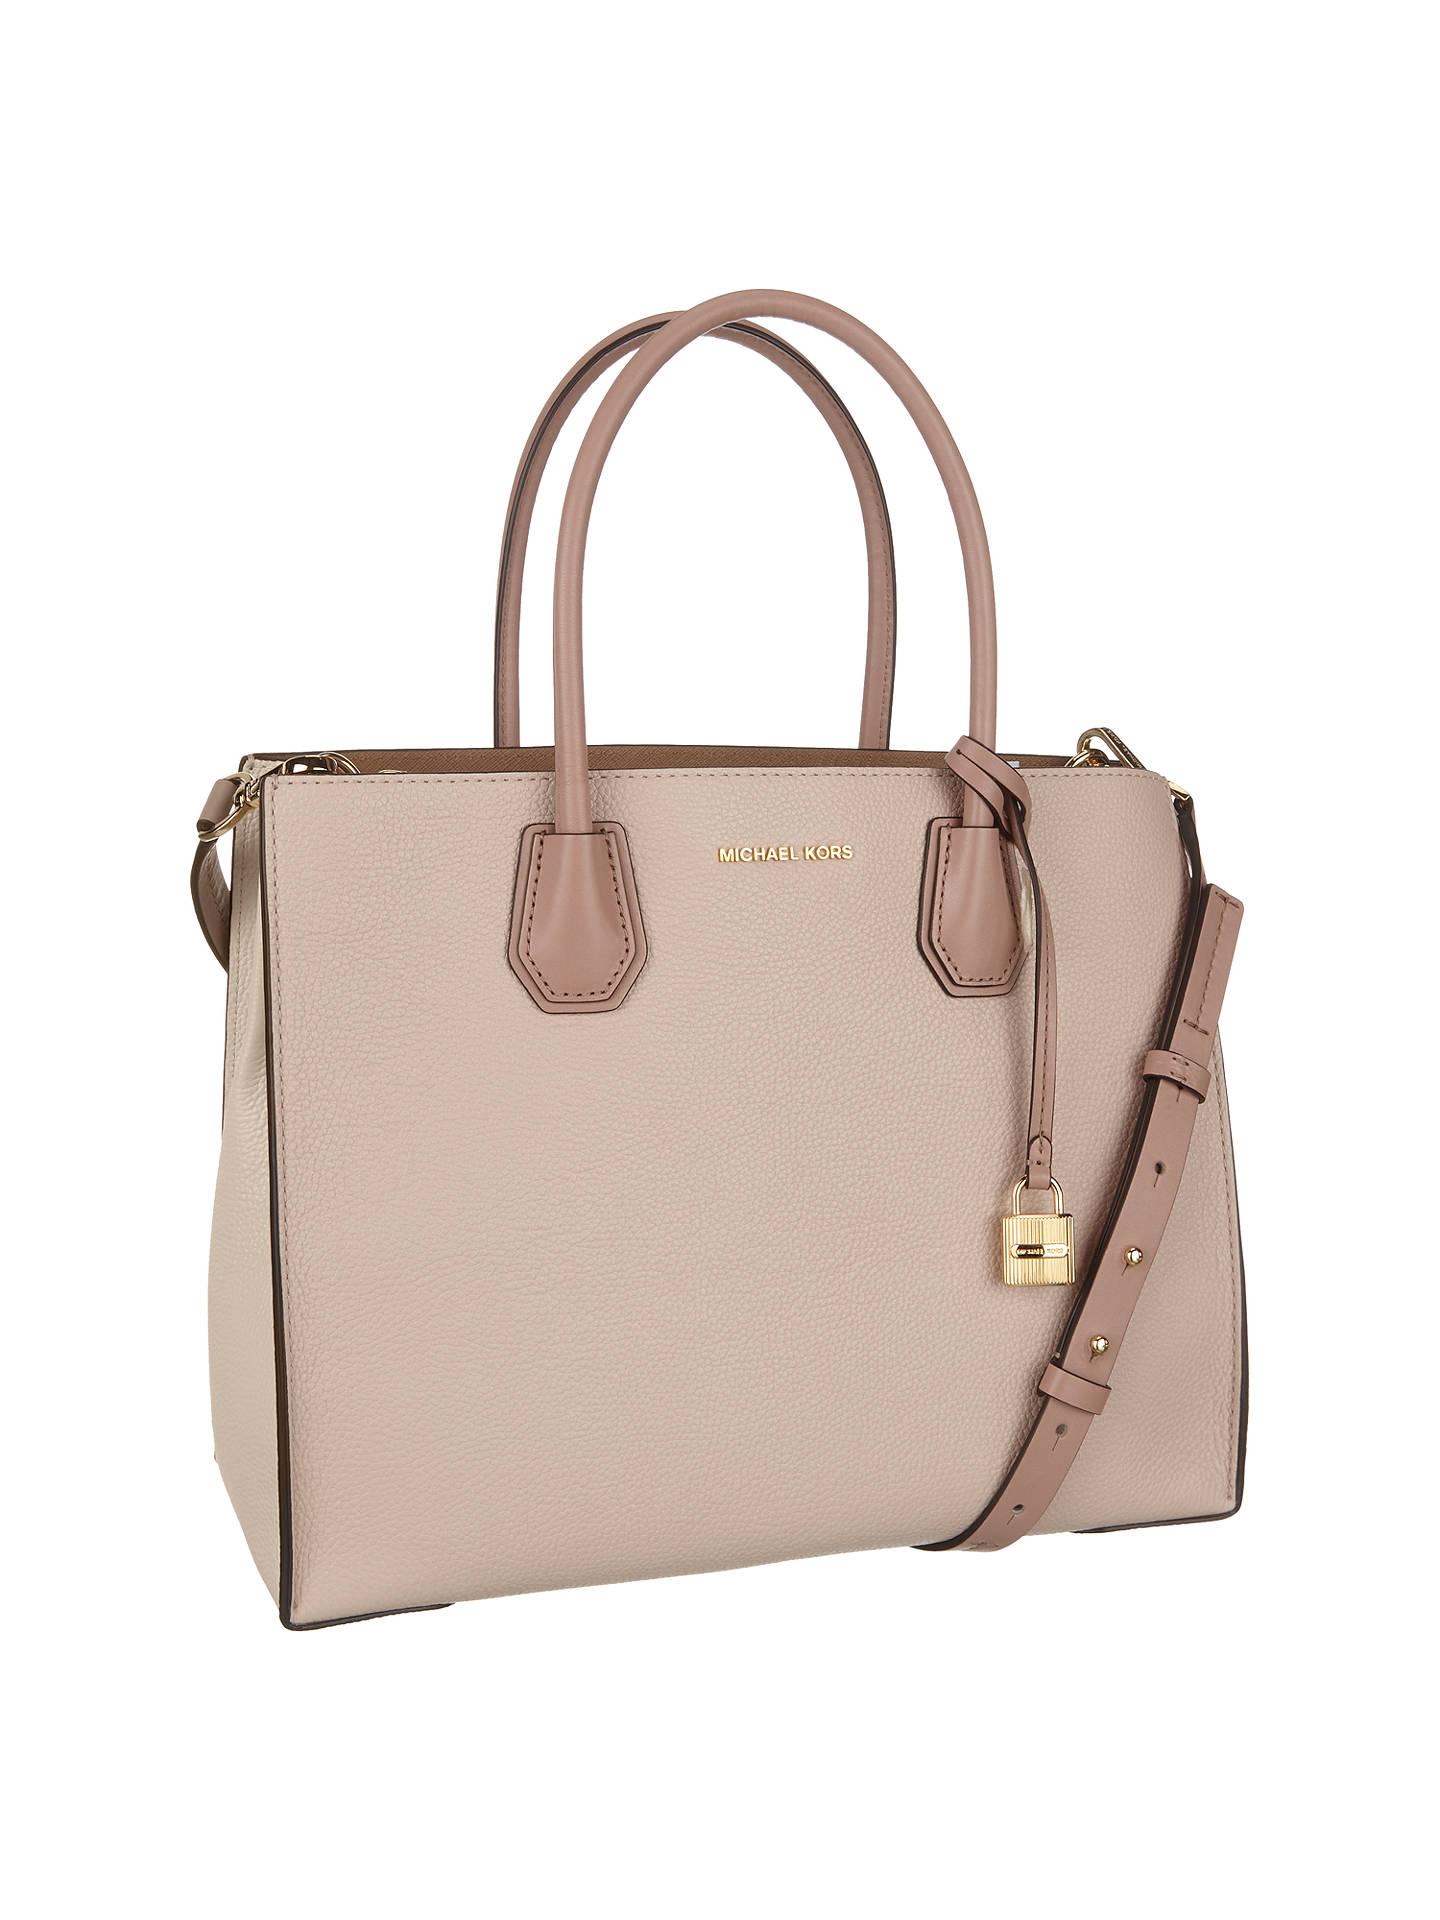 b22f31e18e67 ... Buy MICHAEL Michael Kors Mercer Large Leather Tote Bag, Multi Online at  johnlewis.com